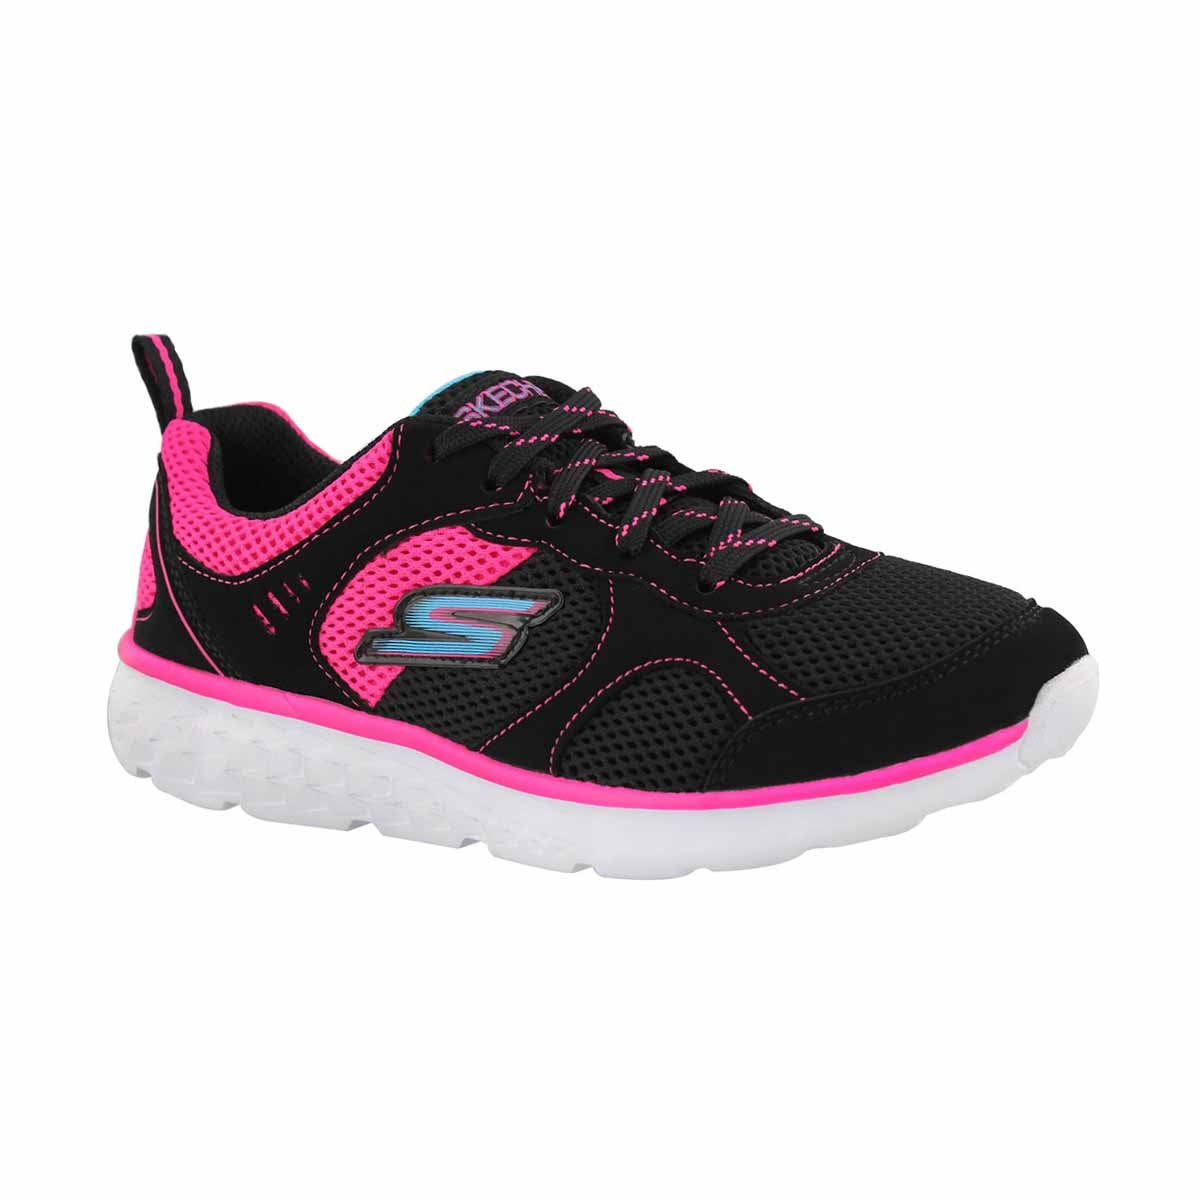 Girls' GORun 400 black/pink sneaker